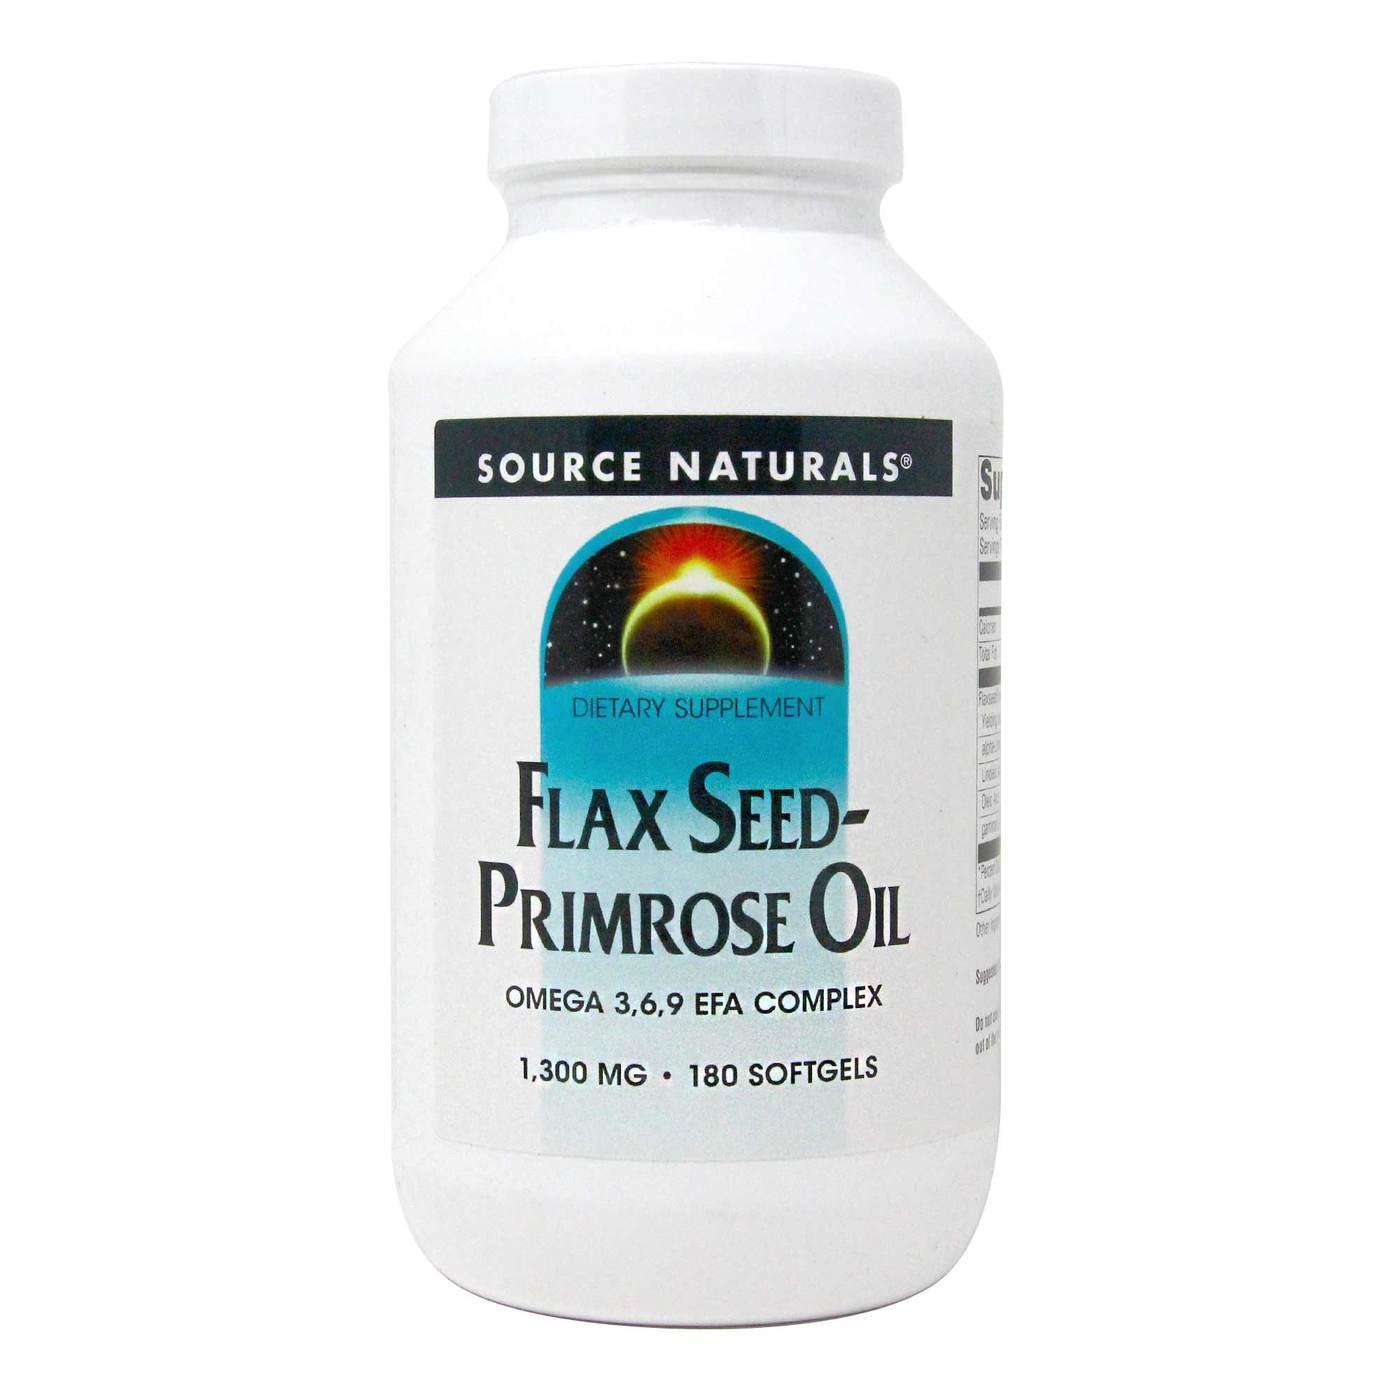 Source Naturals Flax Seed Primrose Oil 1 300 Mg 180 Softgels